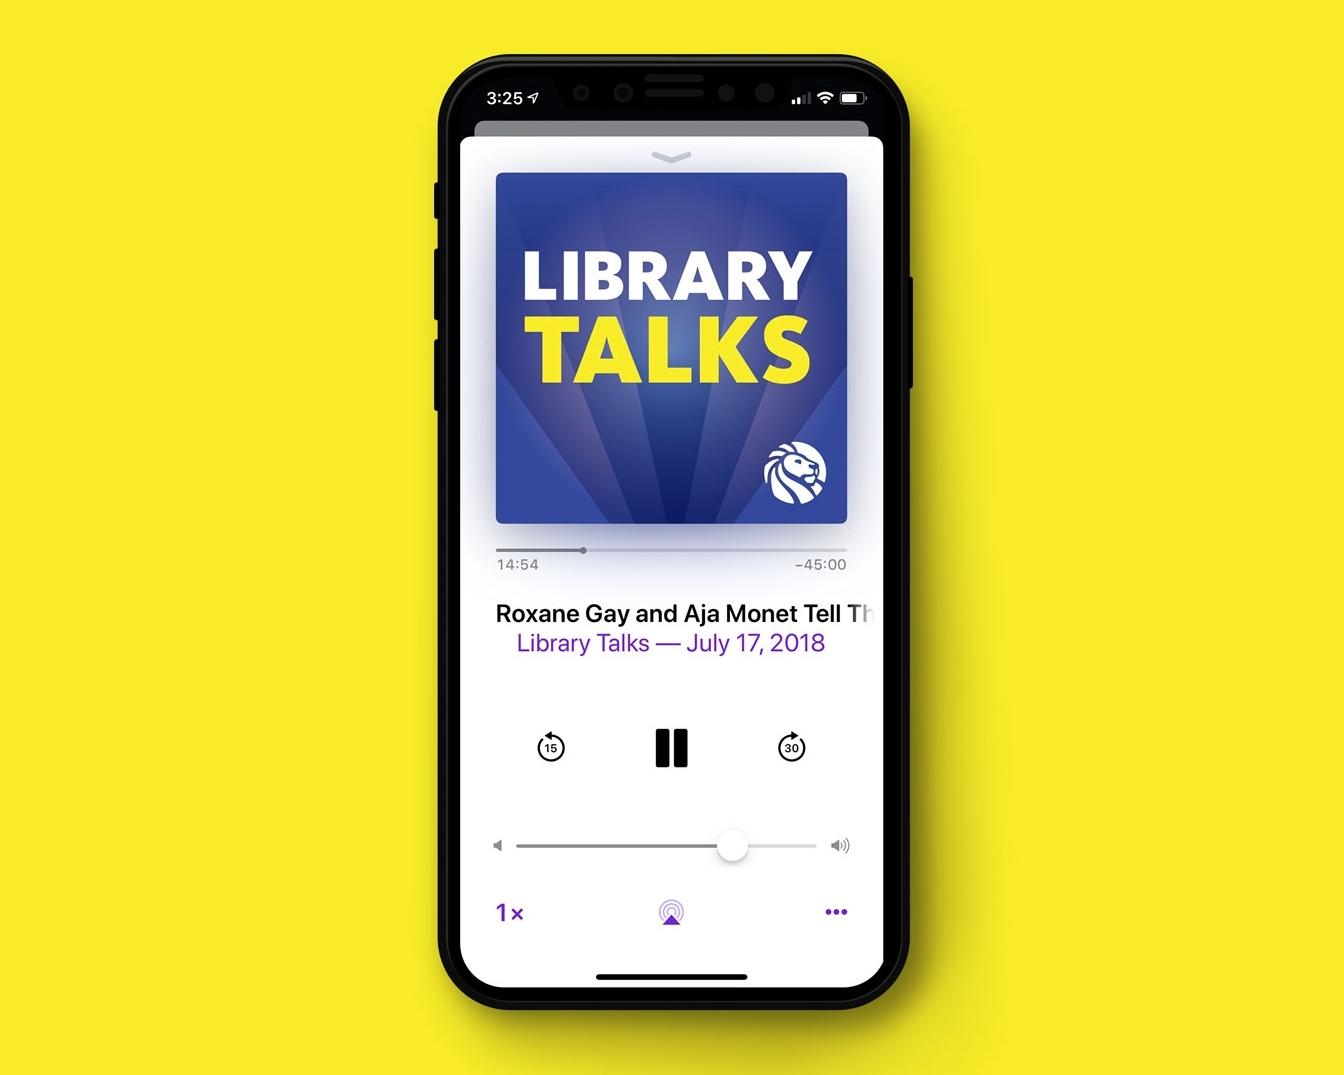 LibraryTalks_Phone.jpg